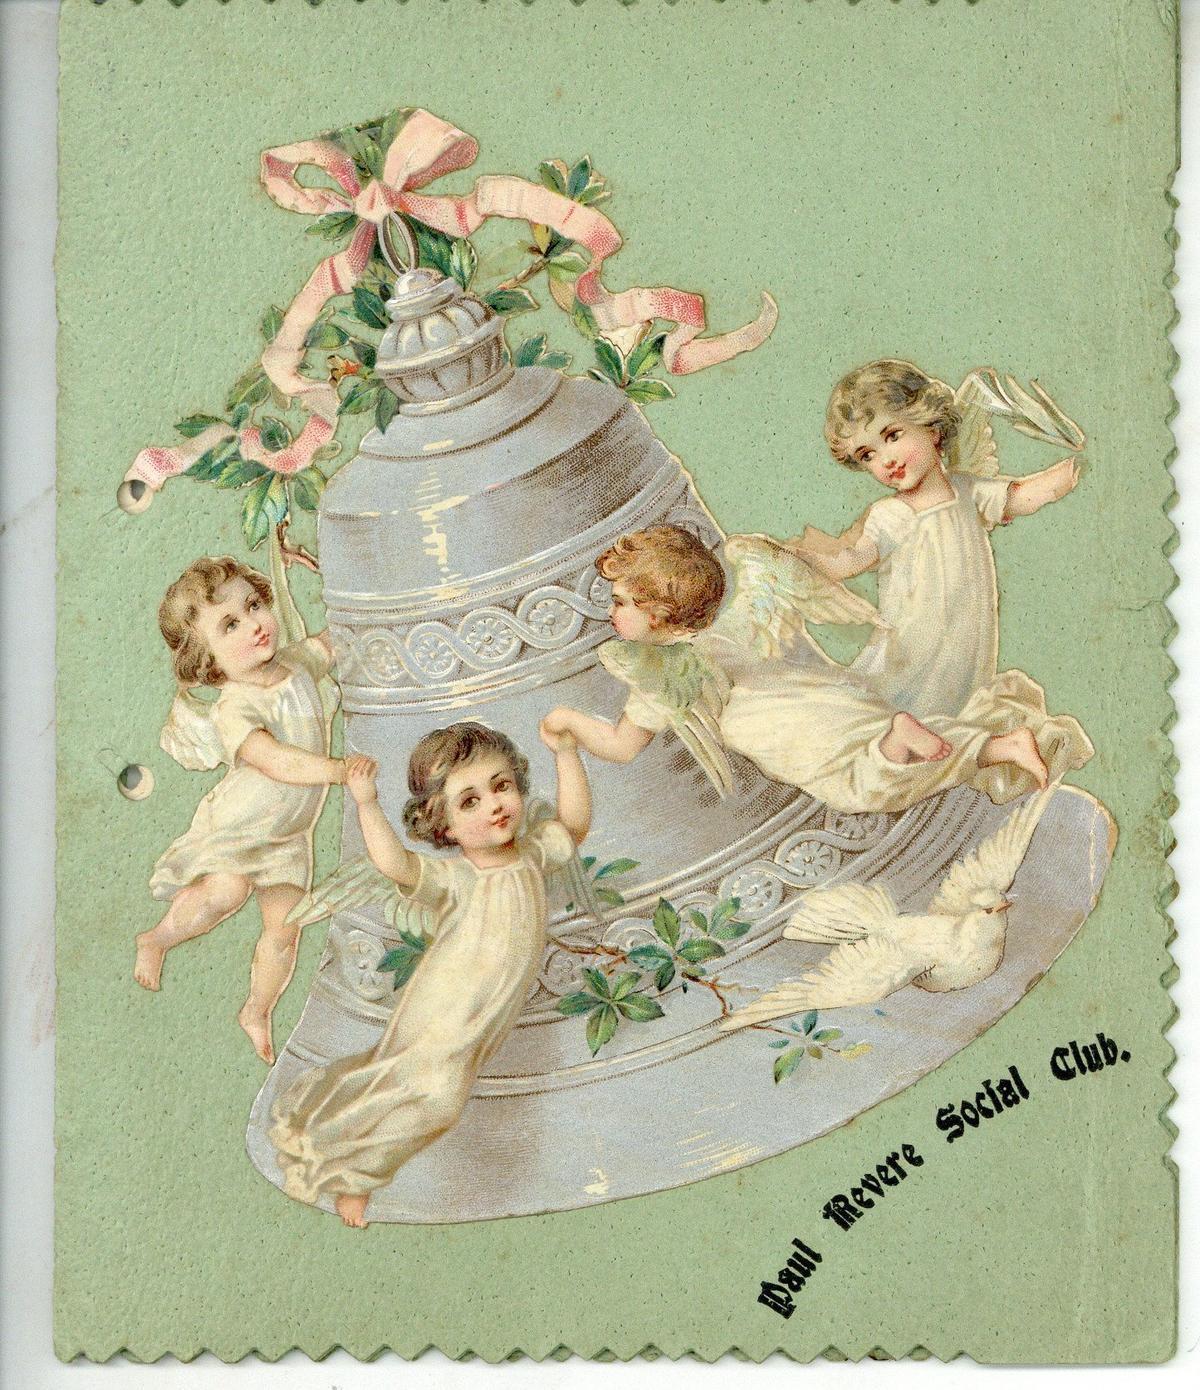 Paul Revere Social Club Program